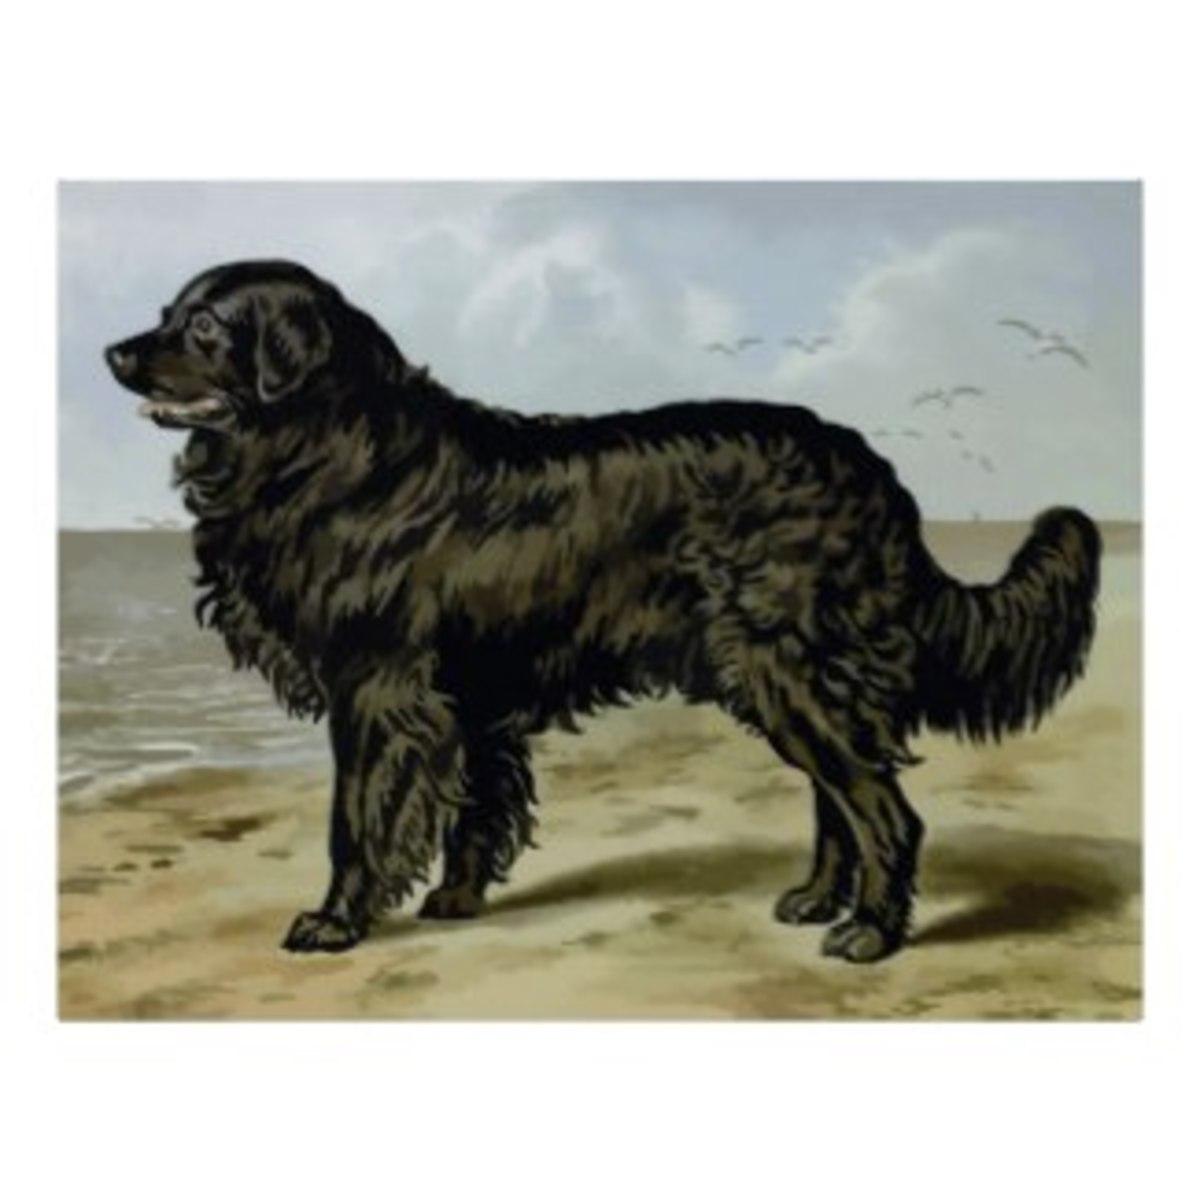 Art print showing a classic Newfoundland dog.